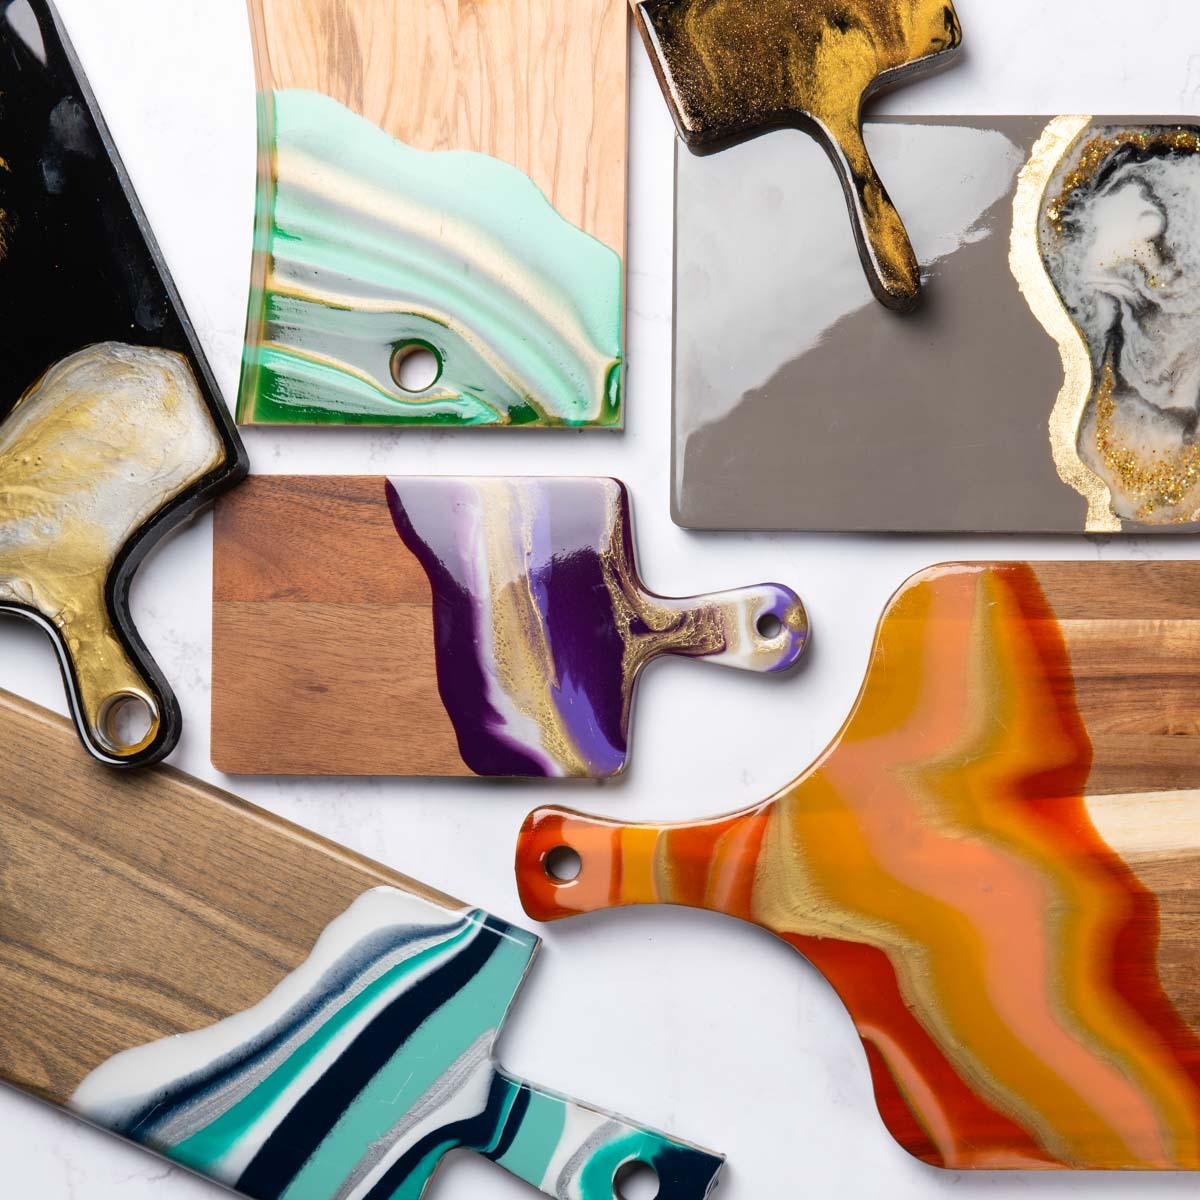 Resin cutting boards